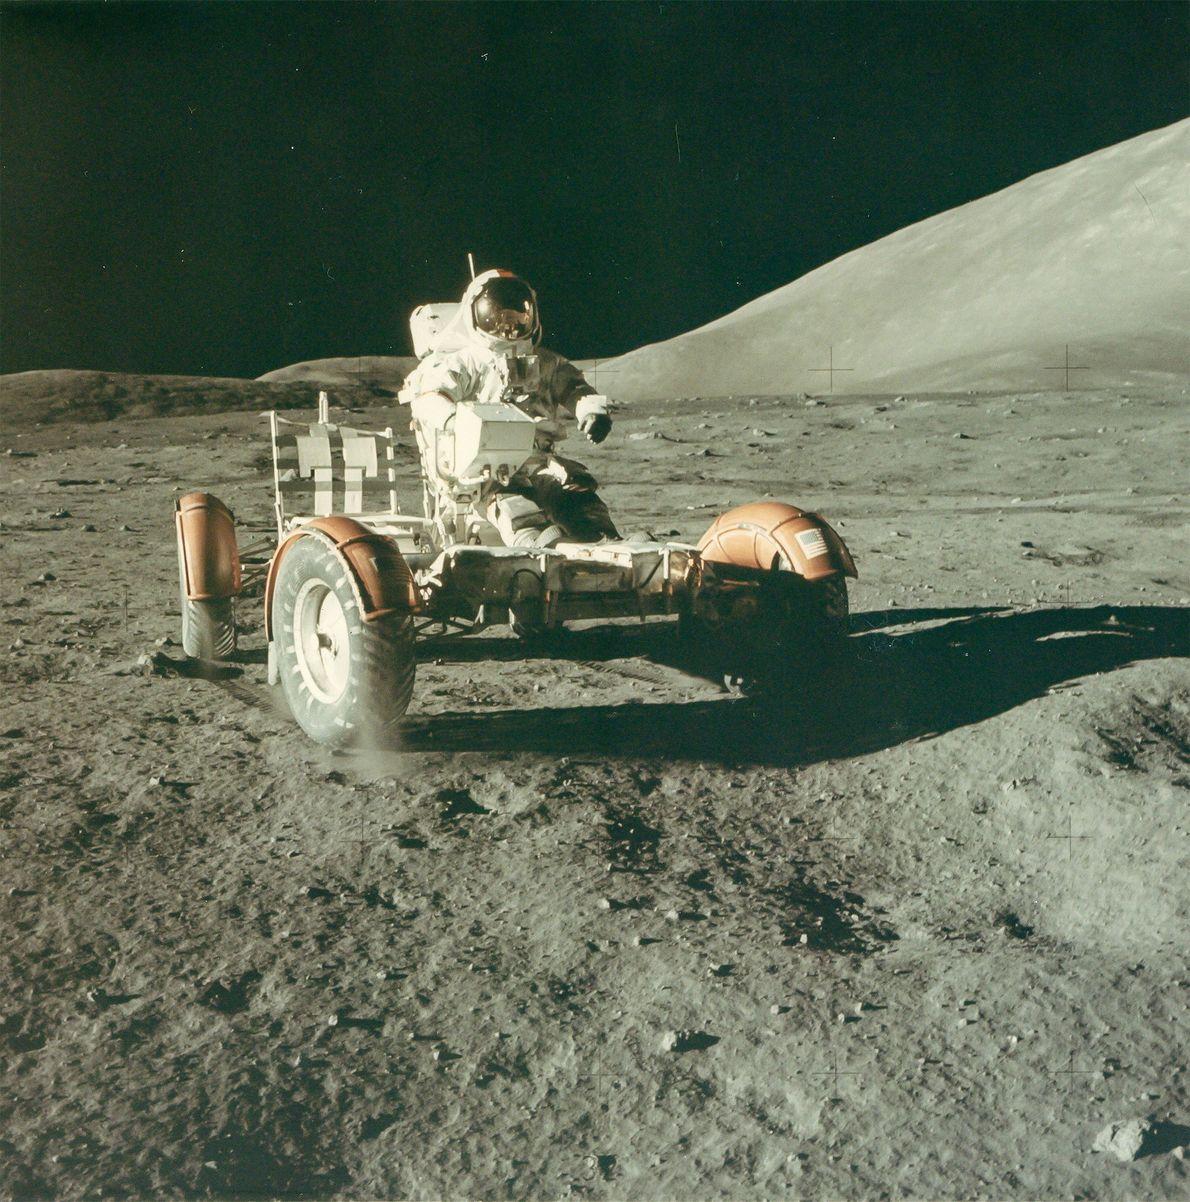 Astronaut Eugene Cernan tests the lunar rover on the moon. His Apollo 17 partner Harrison Schmitt ...